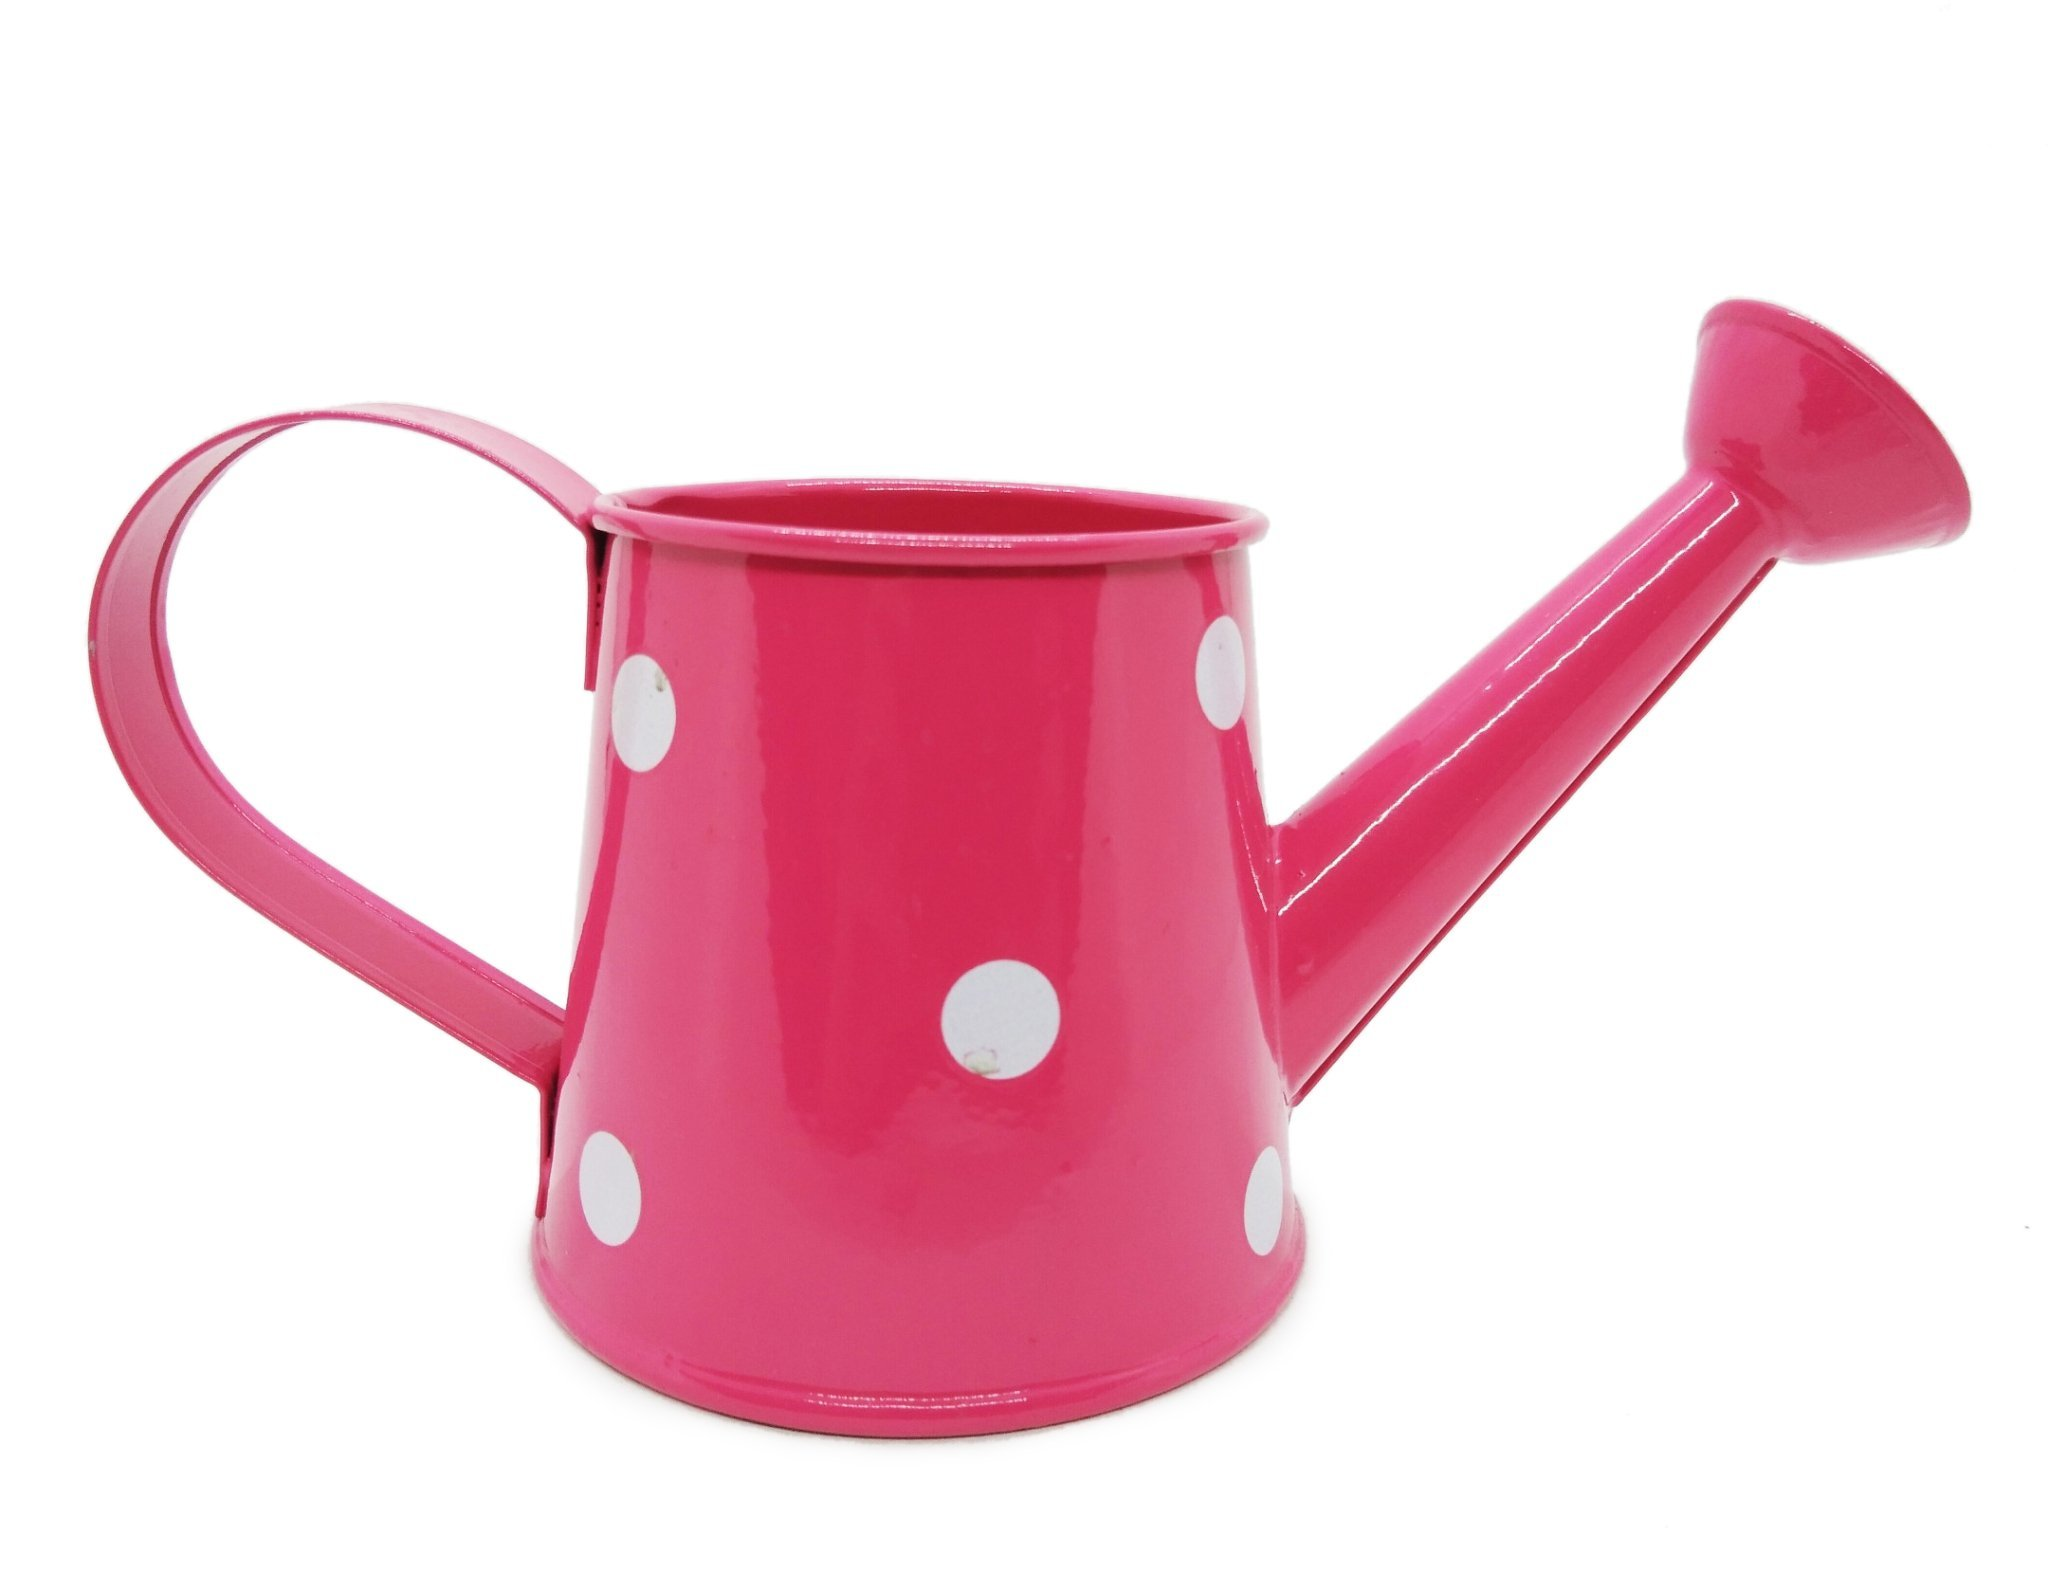 WitnyStore Watering Can Polka Dot Vintage Pot Garden Decor Miniature Sprinkler Nozzle Flower Arrangement (Hot Pink)